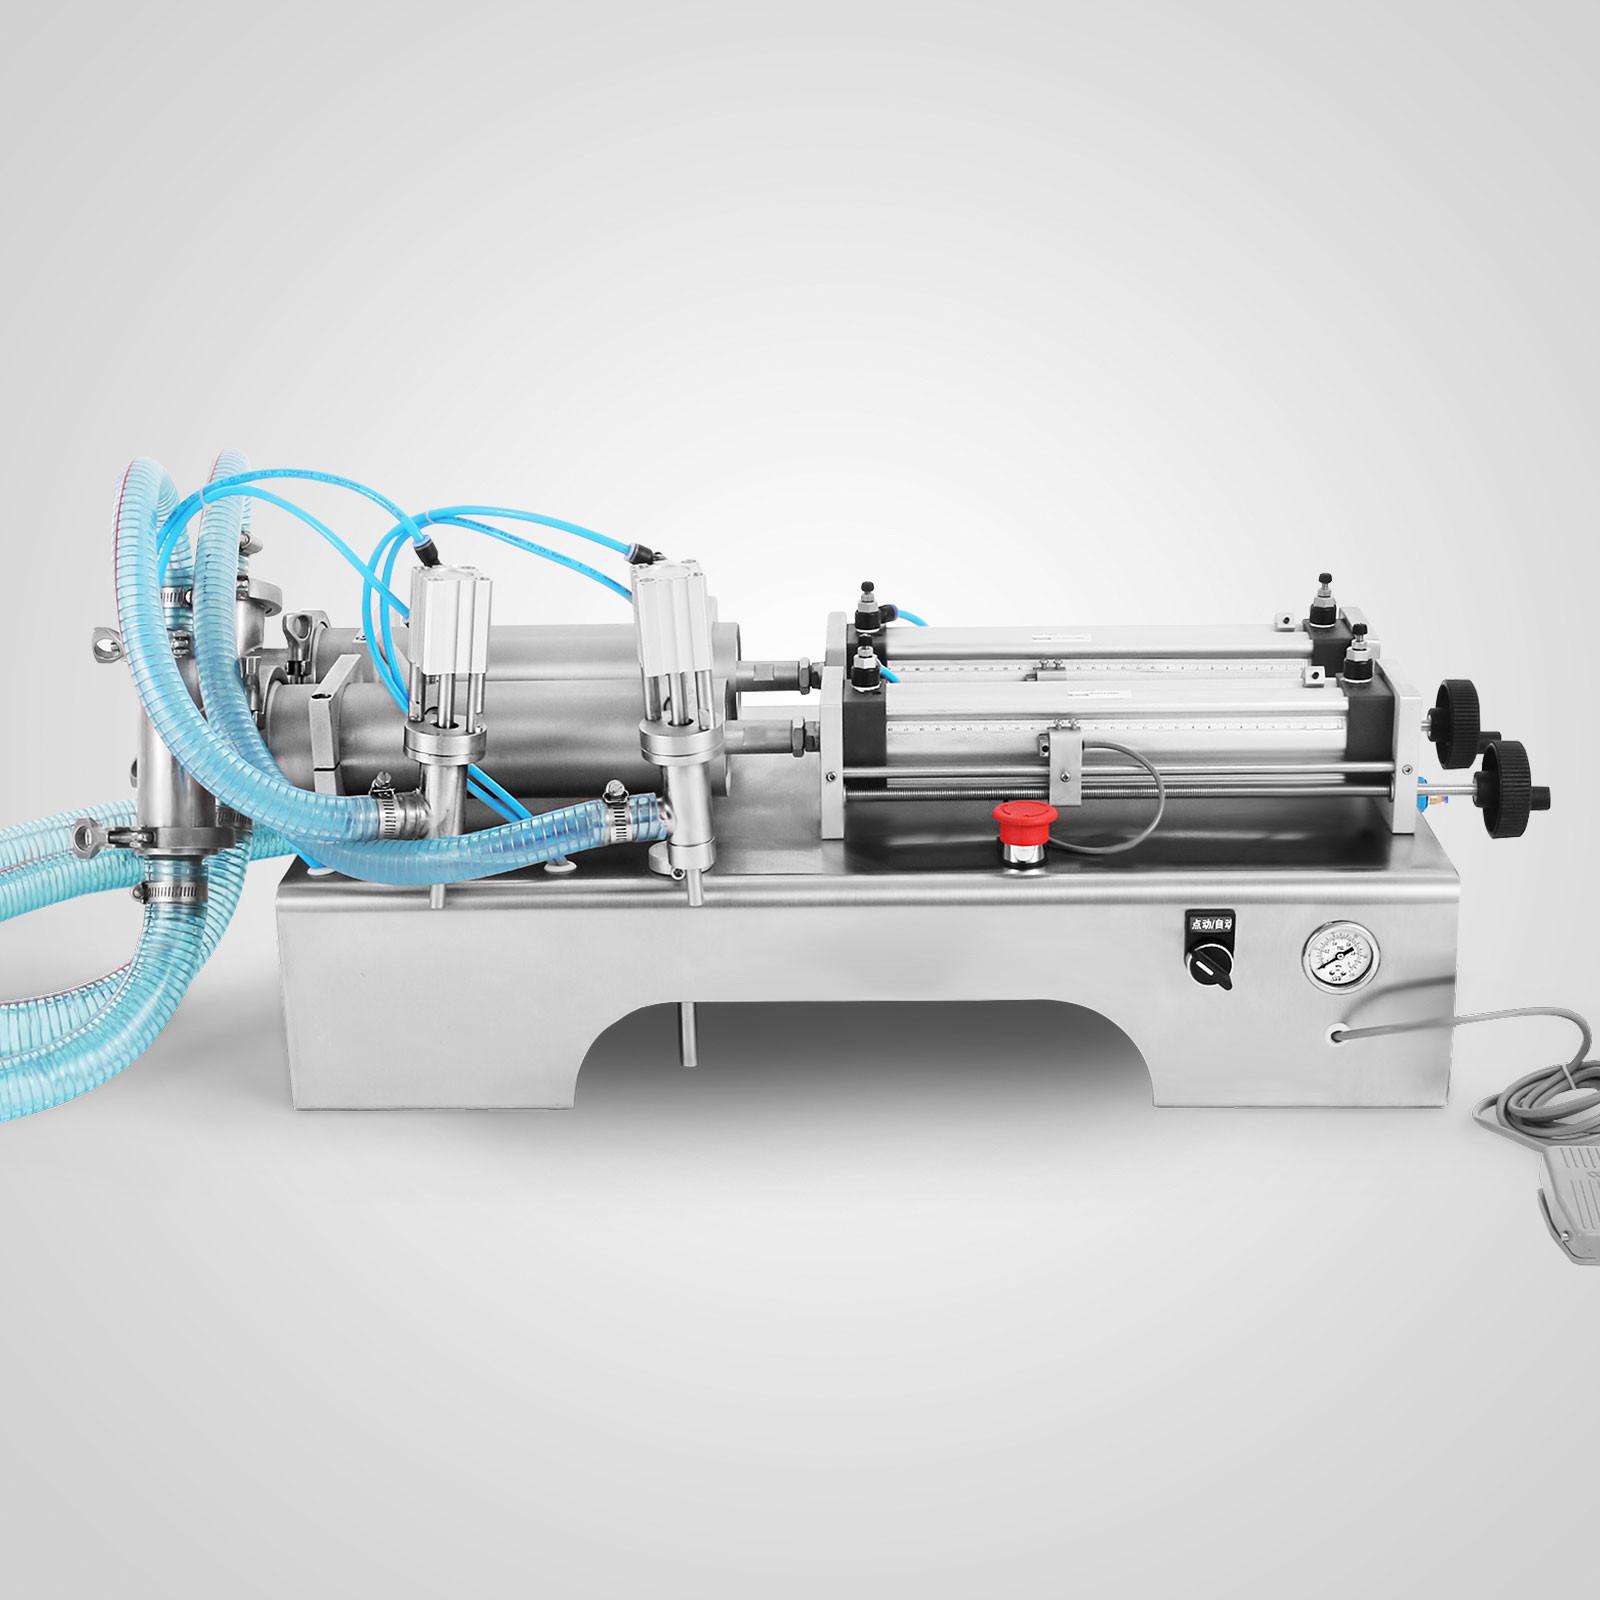 Liquid-Filling-Machine-Filler-Remplissage-2-3500ML-50-500ML-INDUSTRY-SUPPLY miniature 75